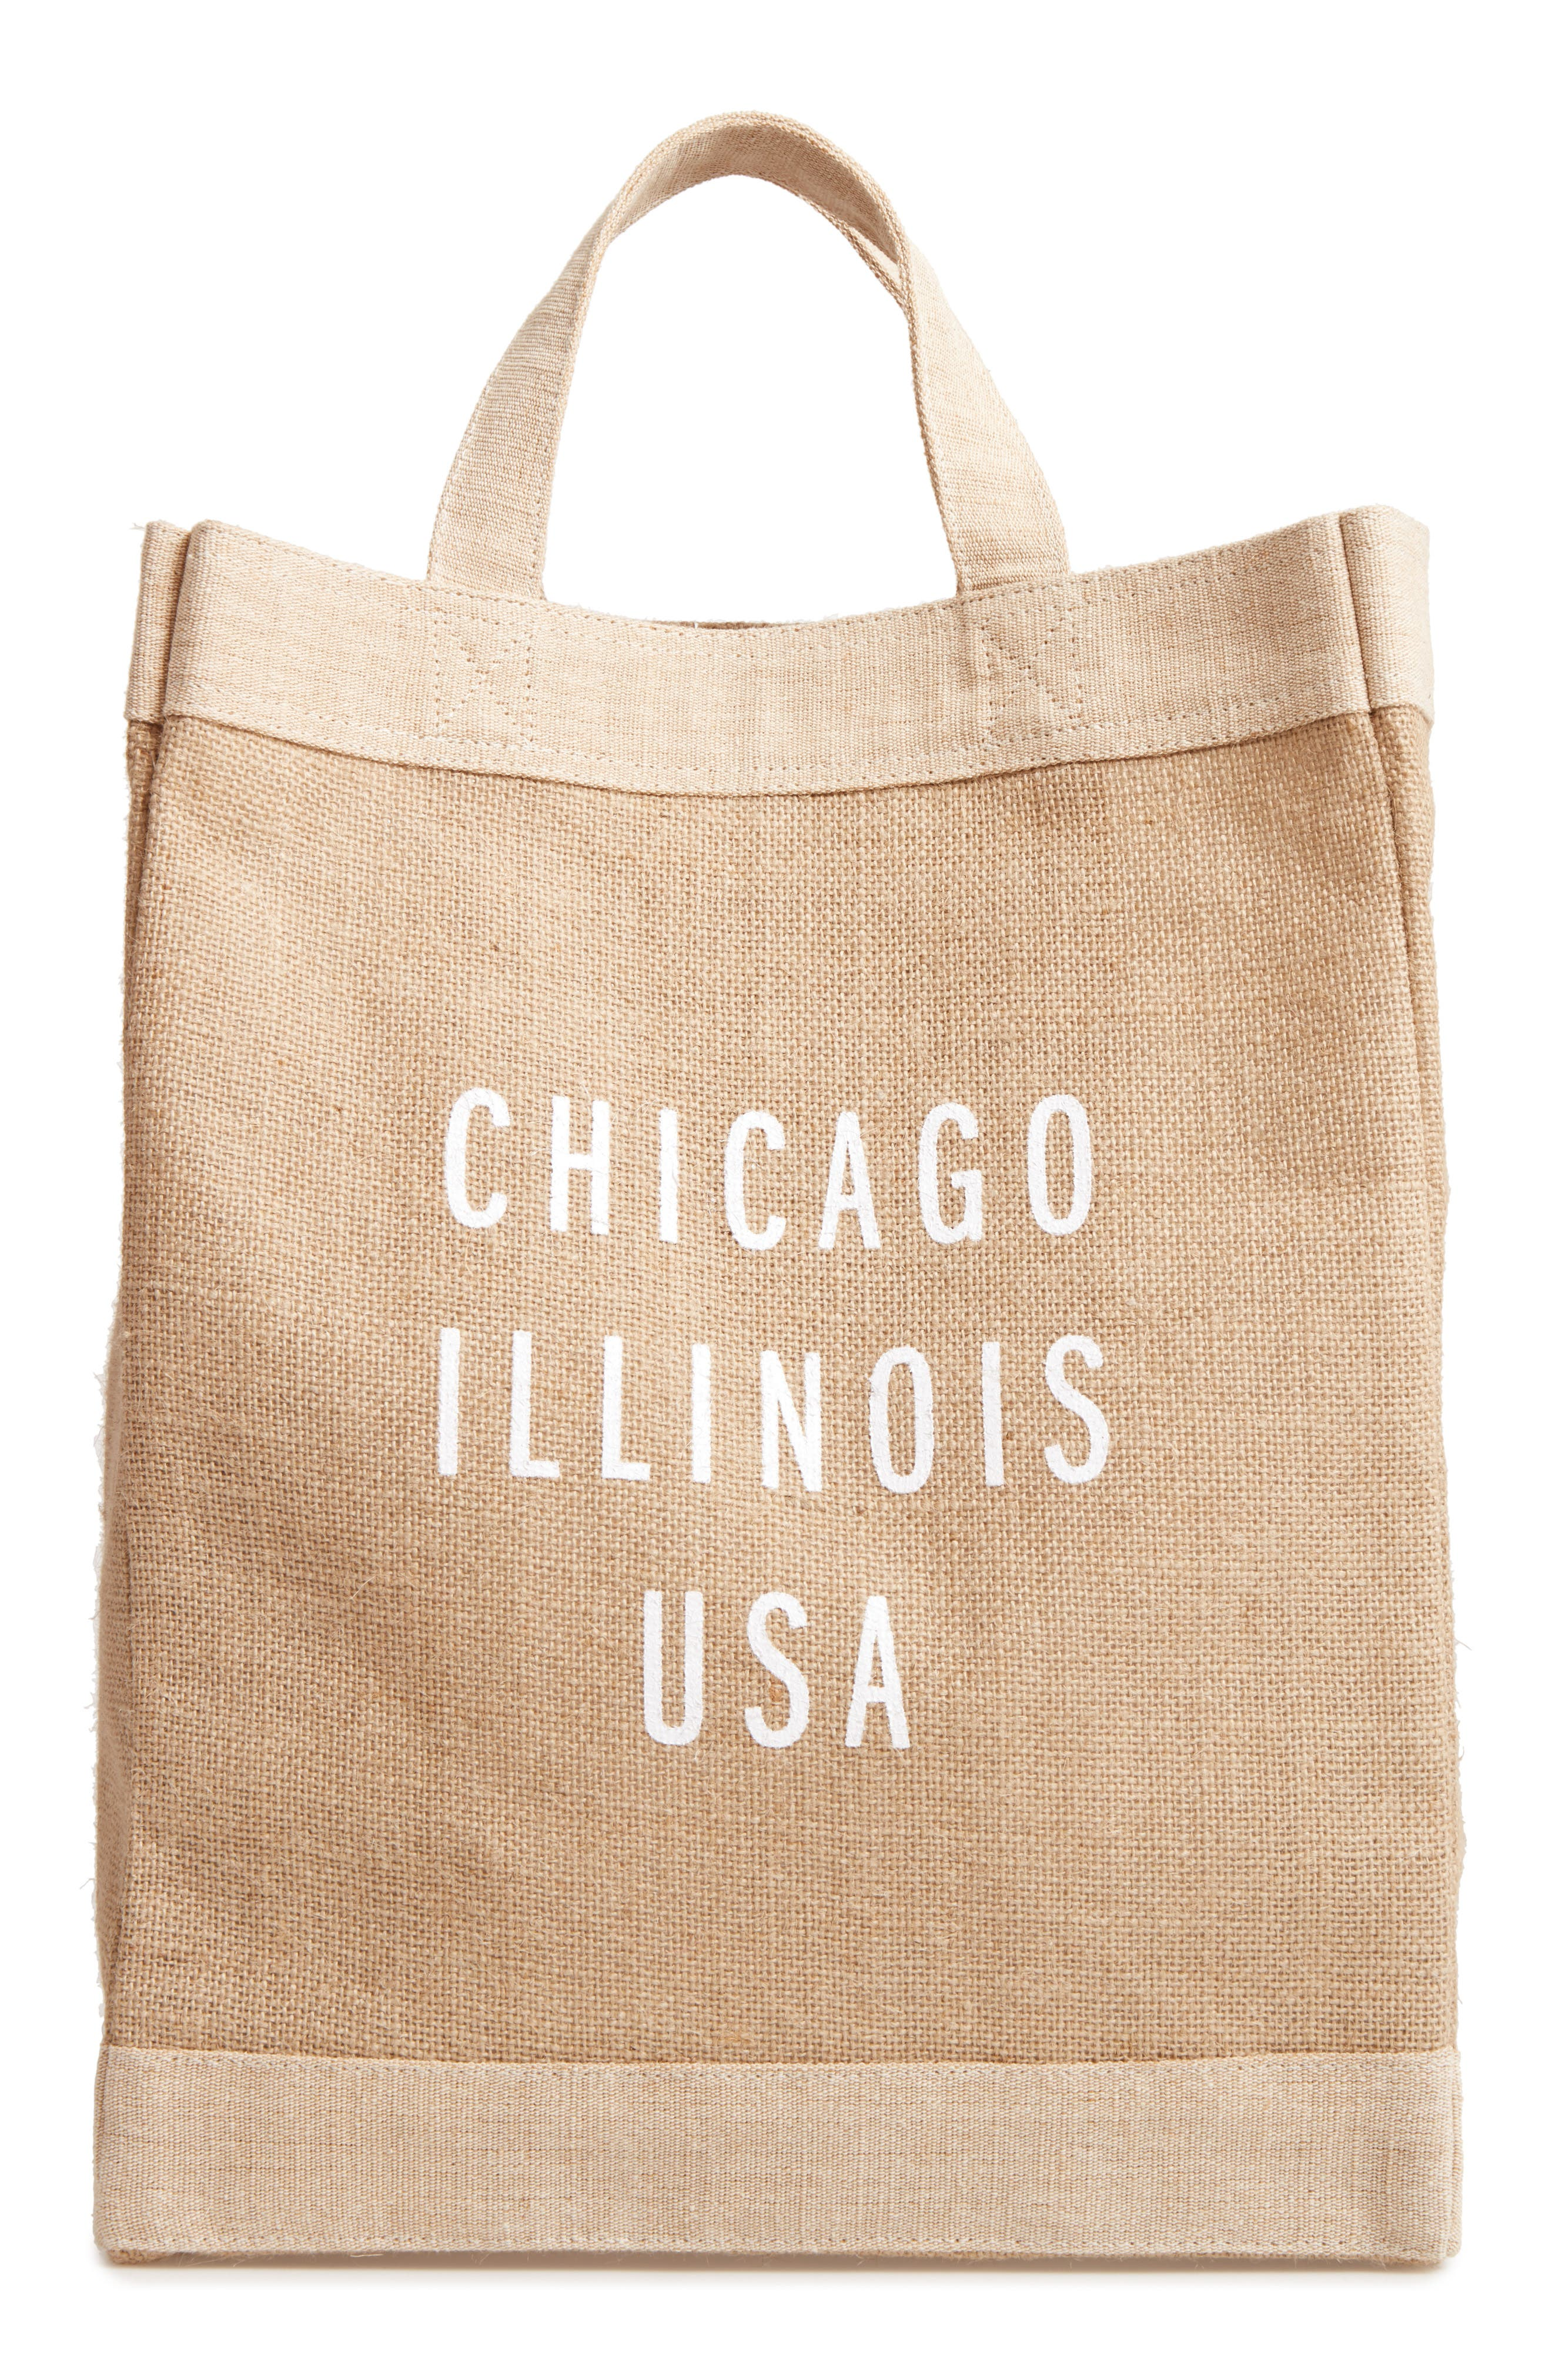 Chicago Simple Market Bag,                         Main,                         color, Natural